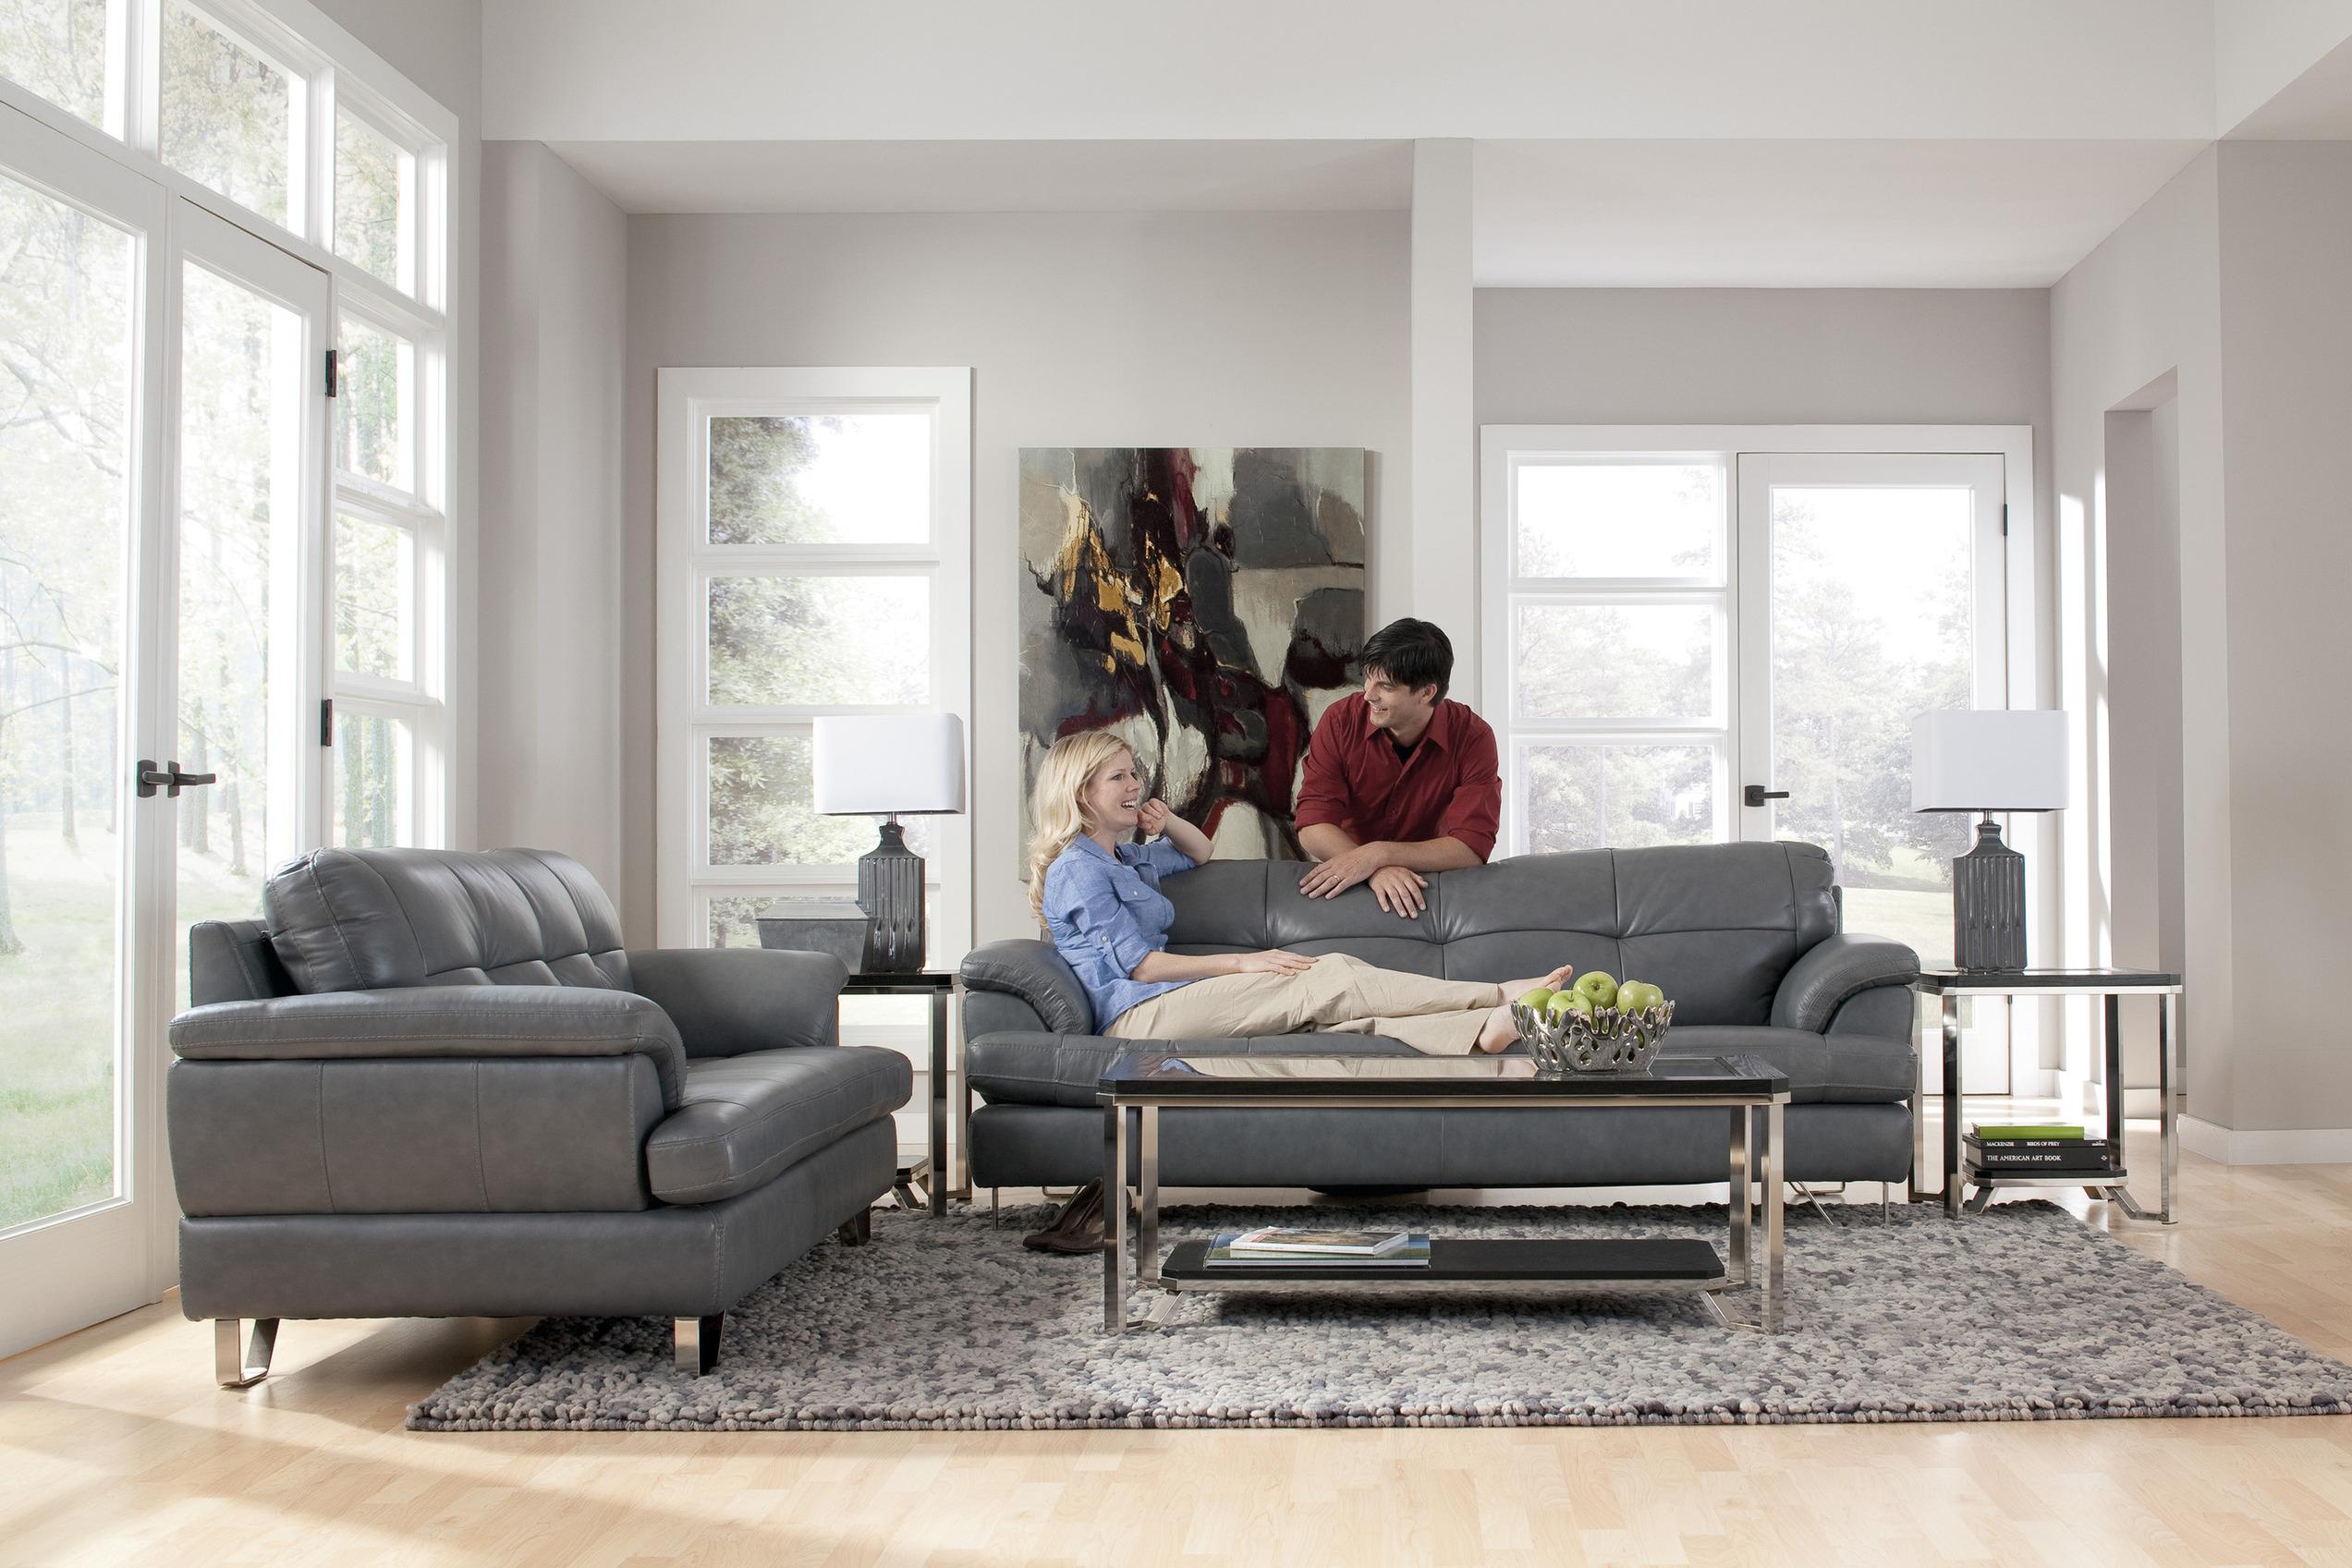 Light Grey Sofa Decorating Ideas Beautiful Living Room Beautiful With Aquarius Dark Grey Sofa Chairs (View 15 of 25)